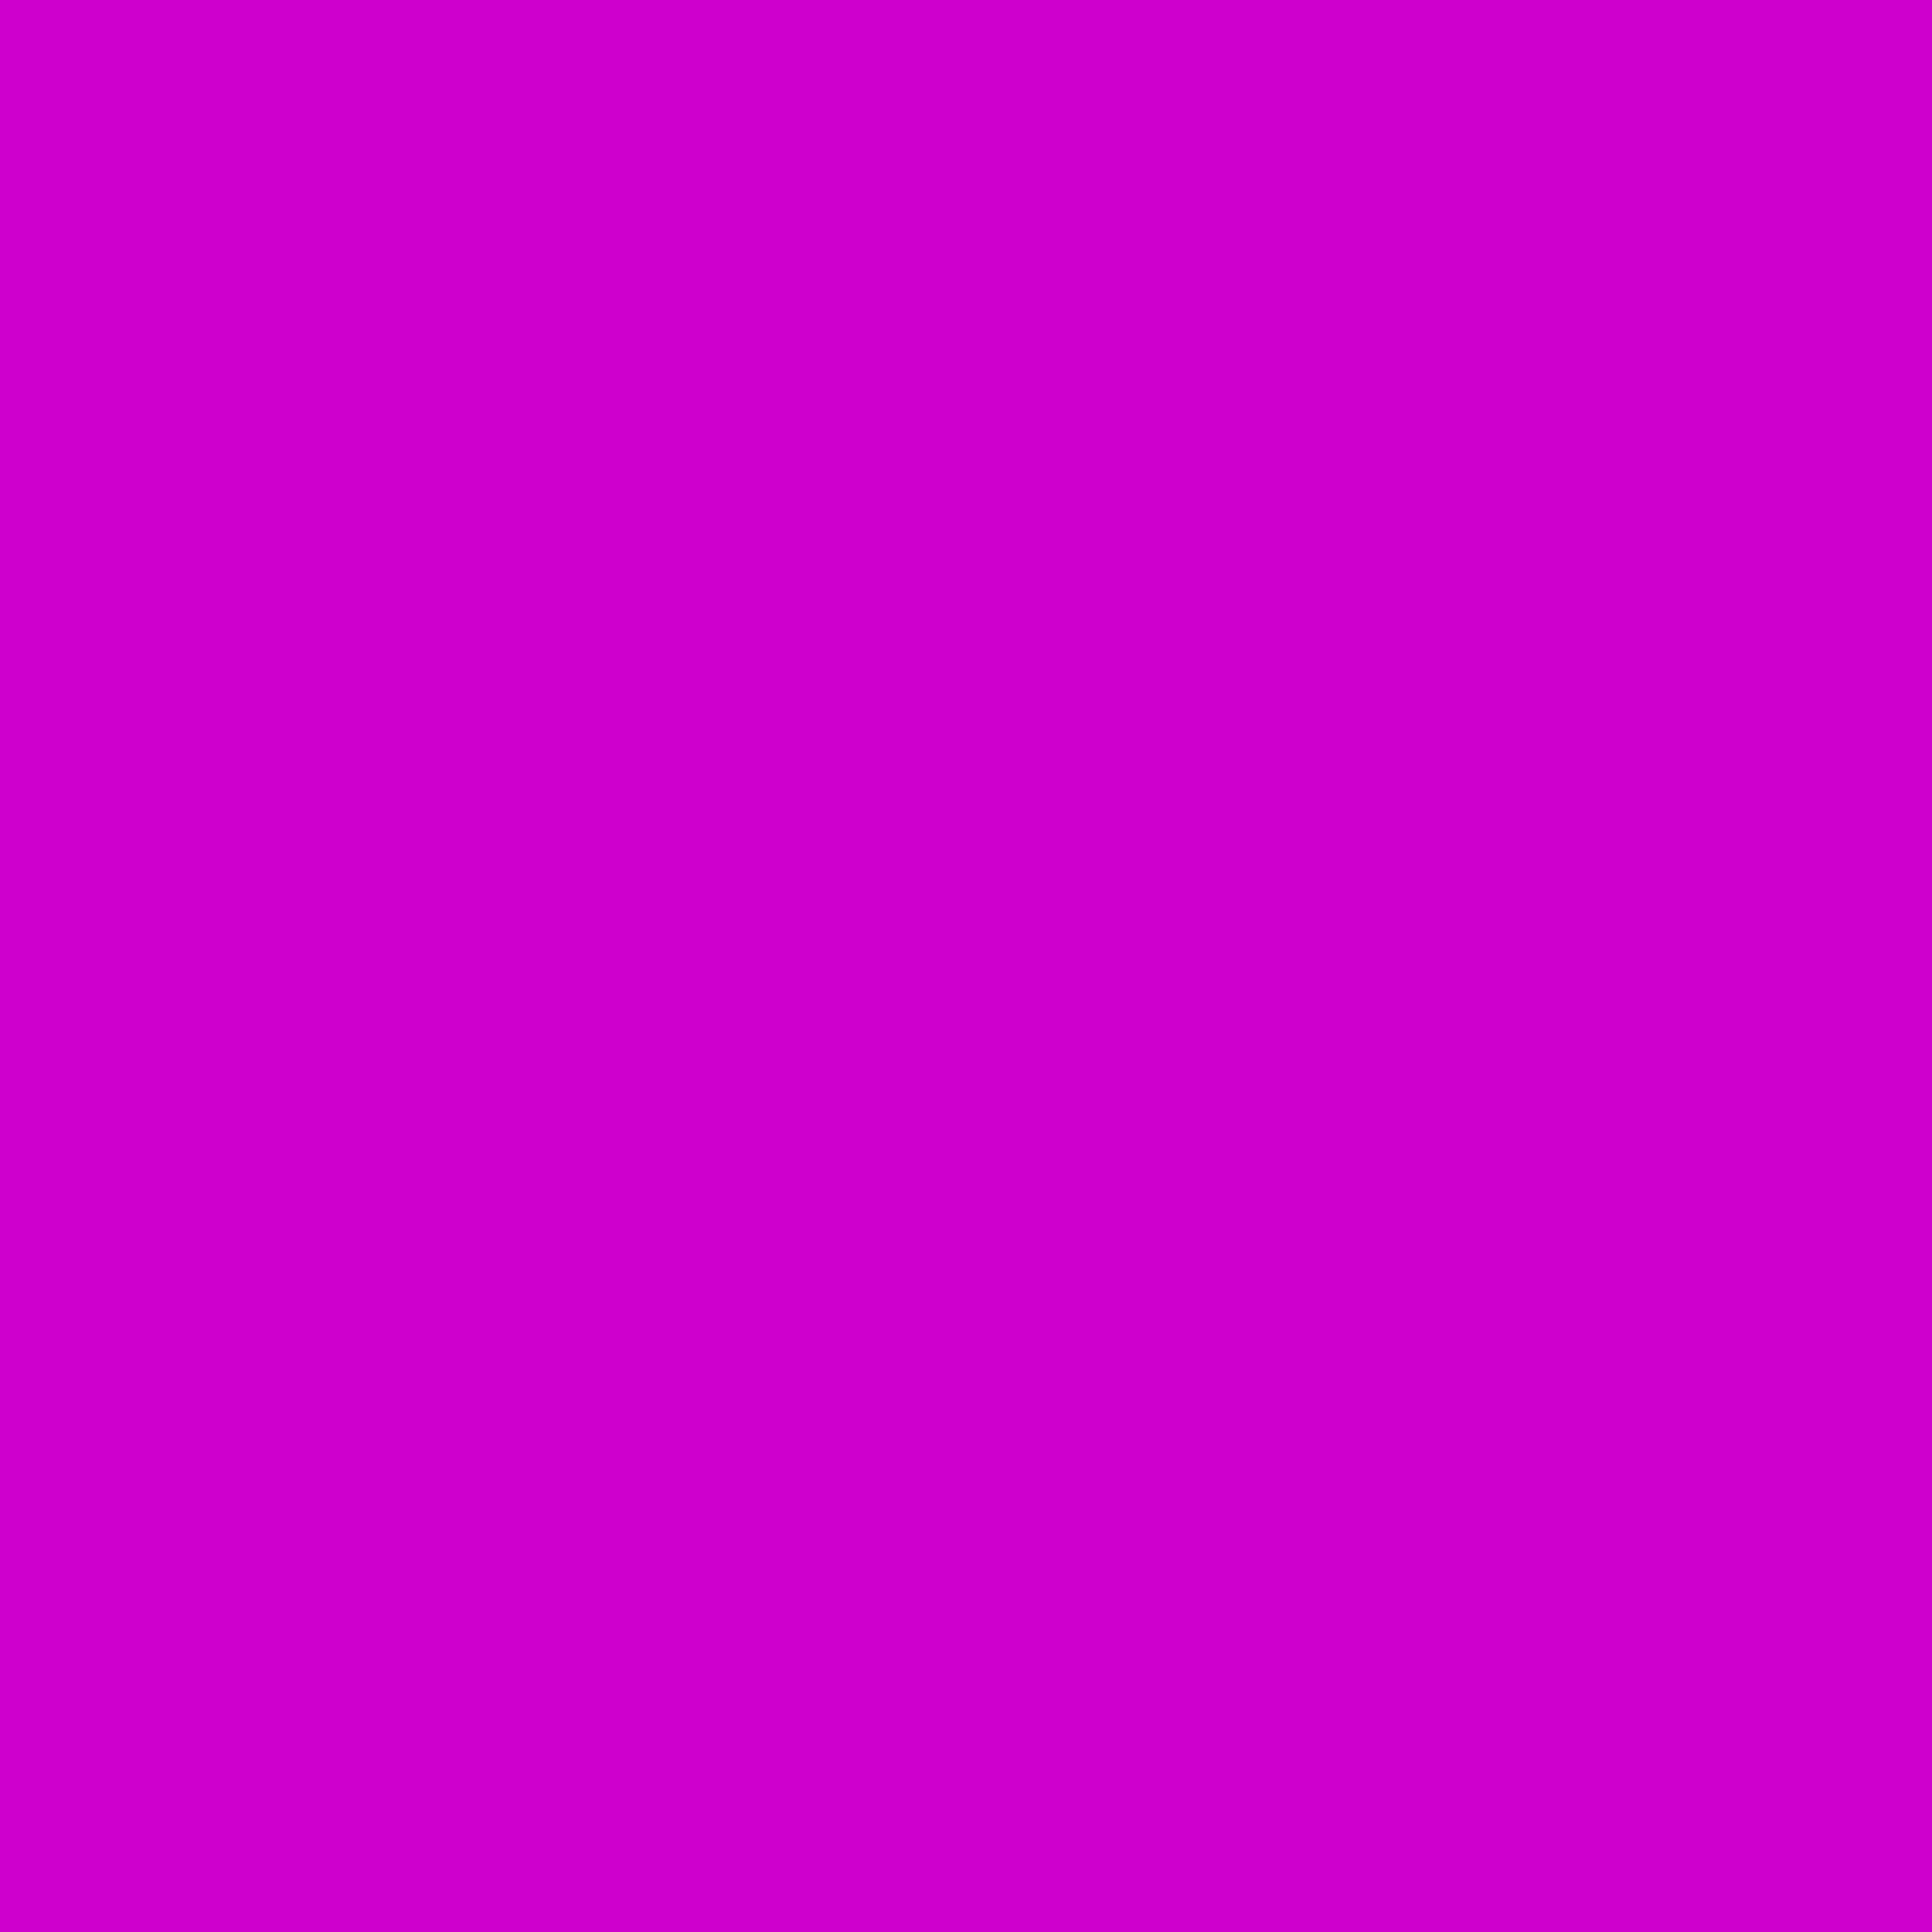 2048x2048 Deep Magenta Solid Color Background